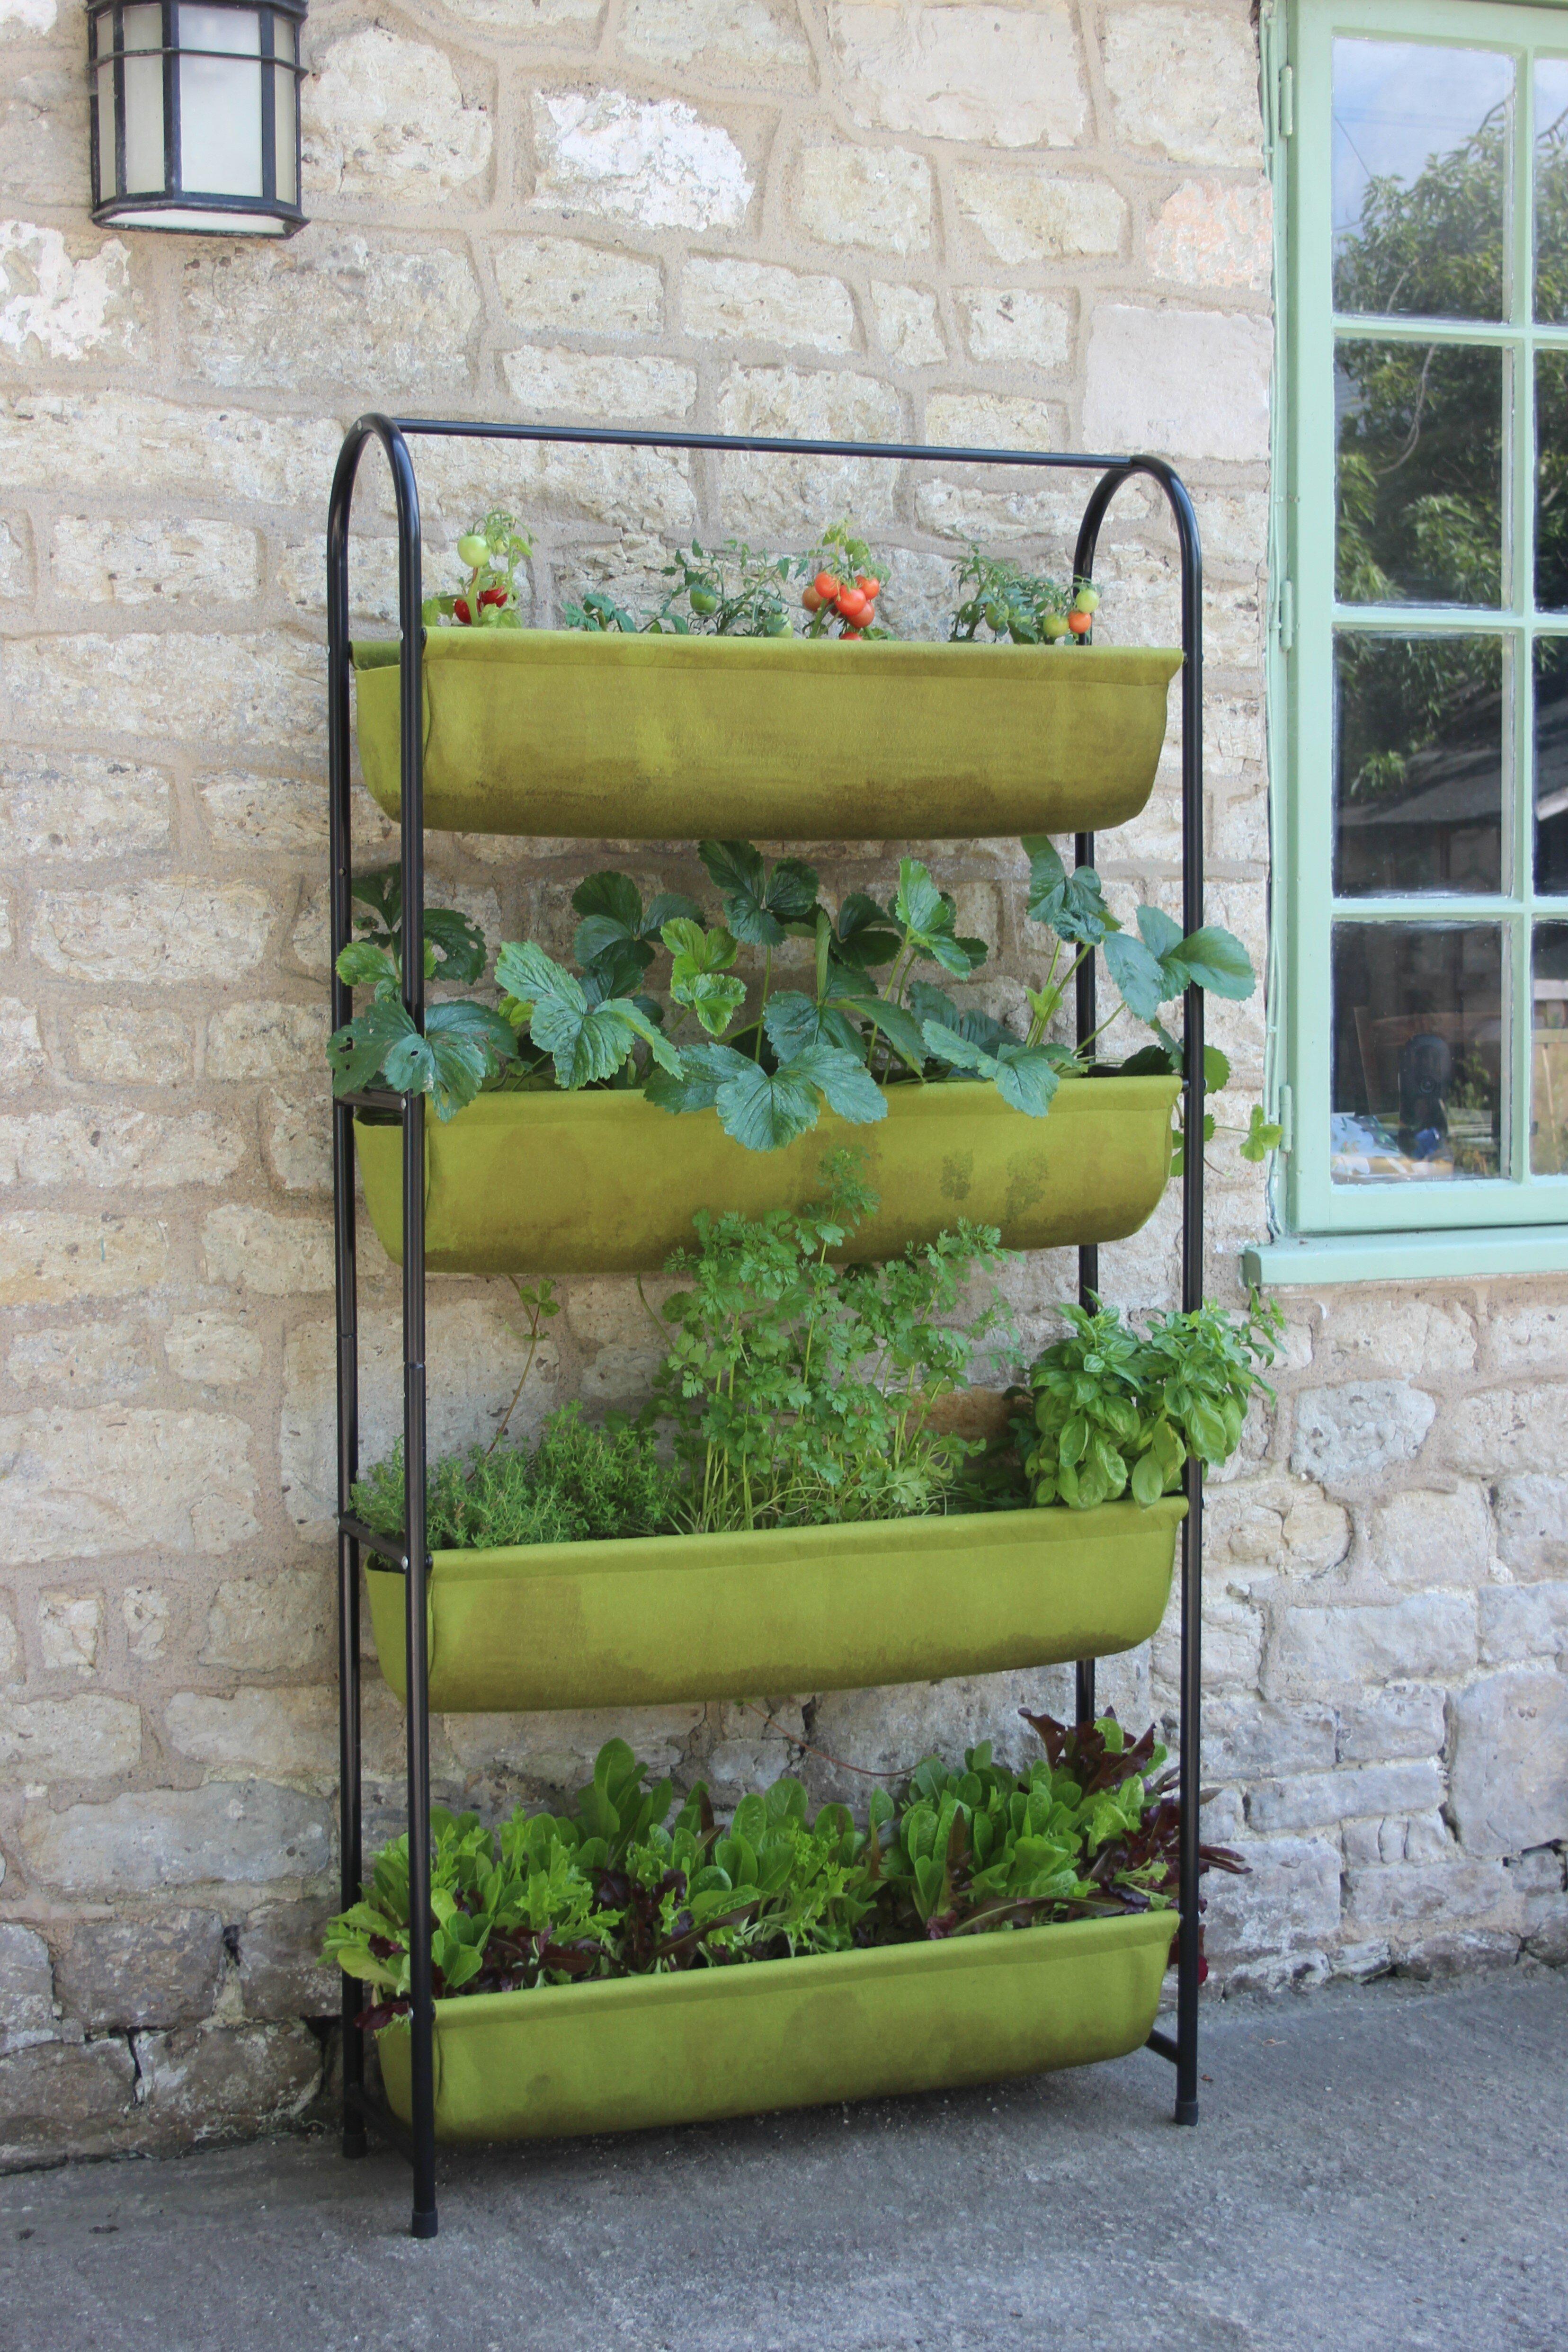 Arlmont Co Tabyana 2 5 Ft X 1 Ft Vertical Garden Reviews Wayfair